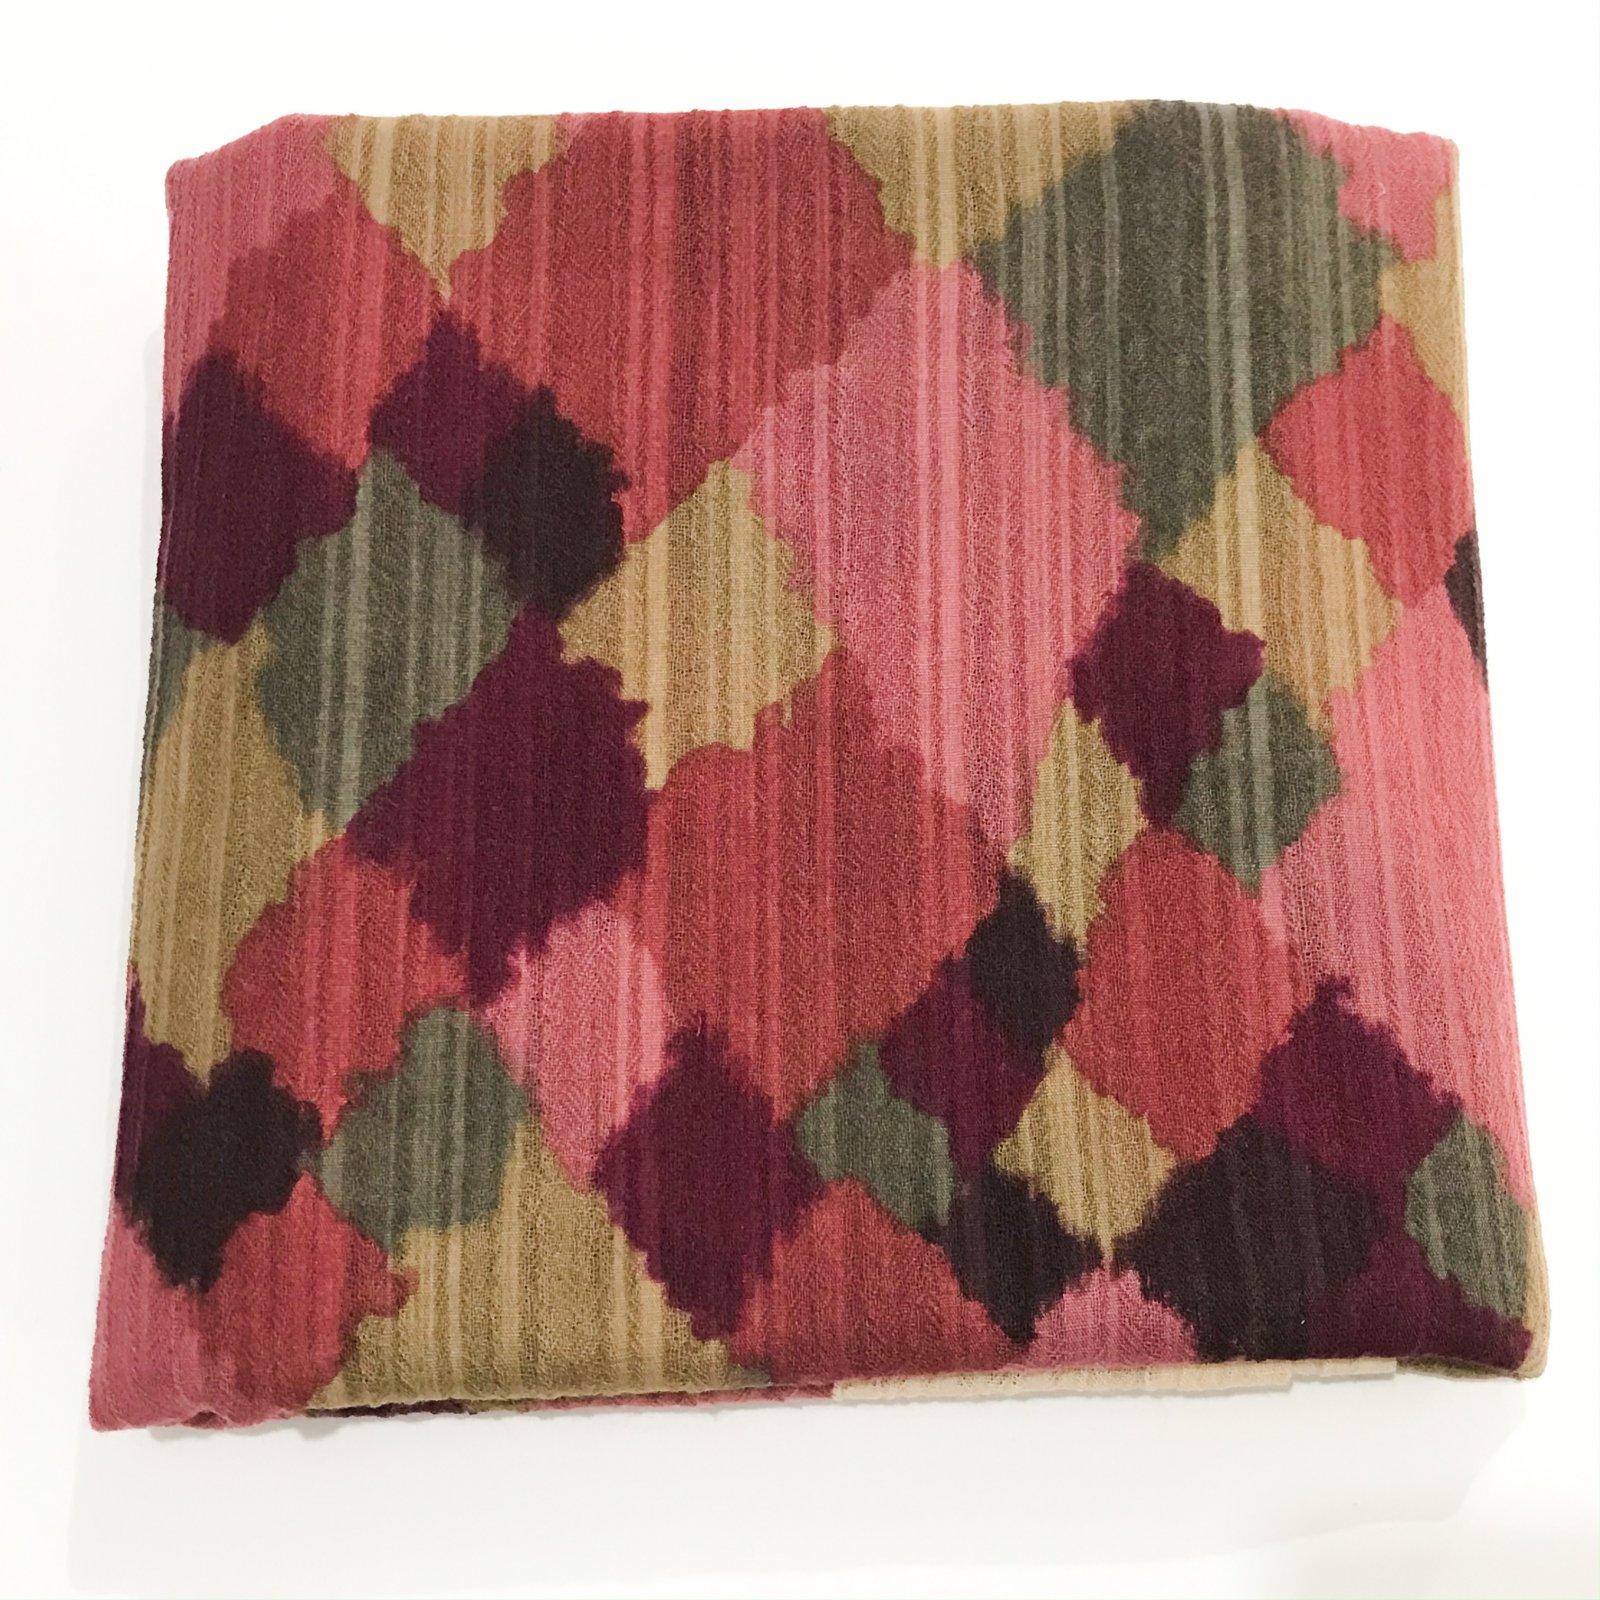 Wool Gauze Crepe - Watercolor in Harlequin - 1 5/8 yard